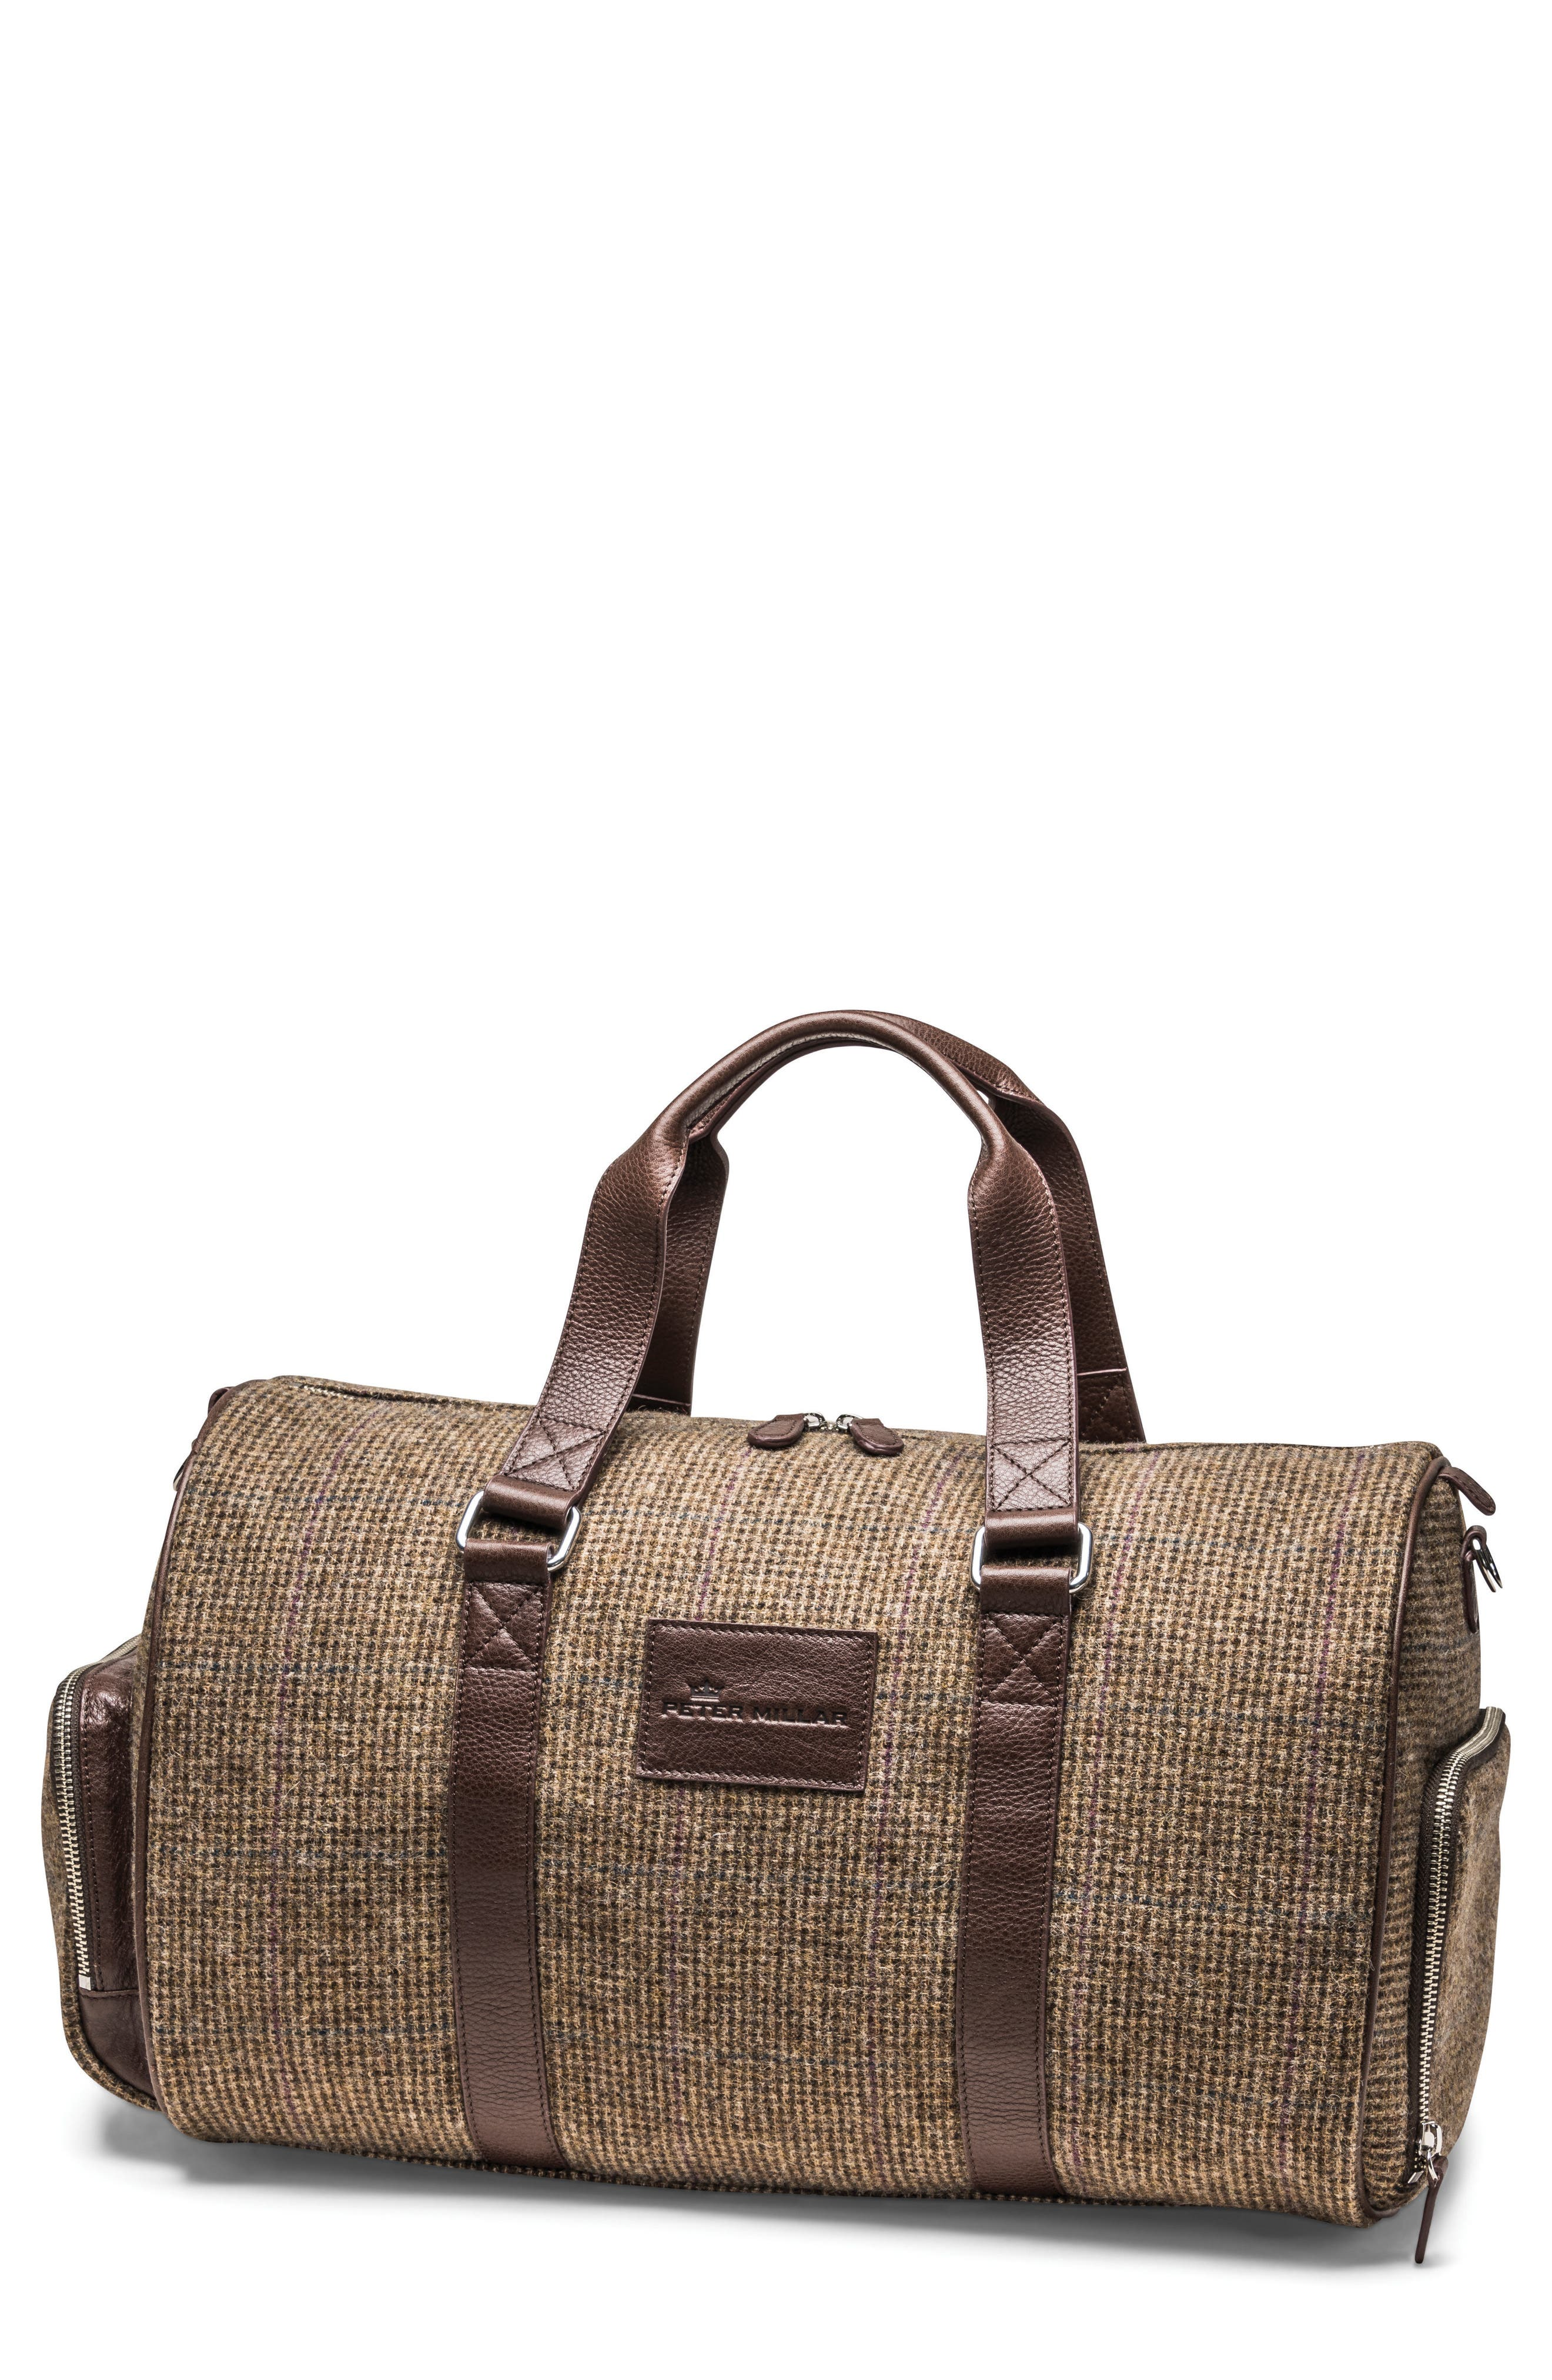 Main Image - Peter Millar Mountainside Day Duffel Bag